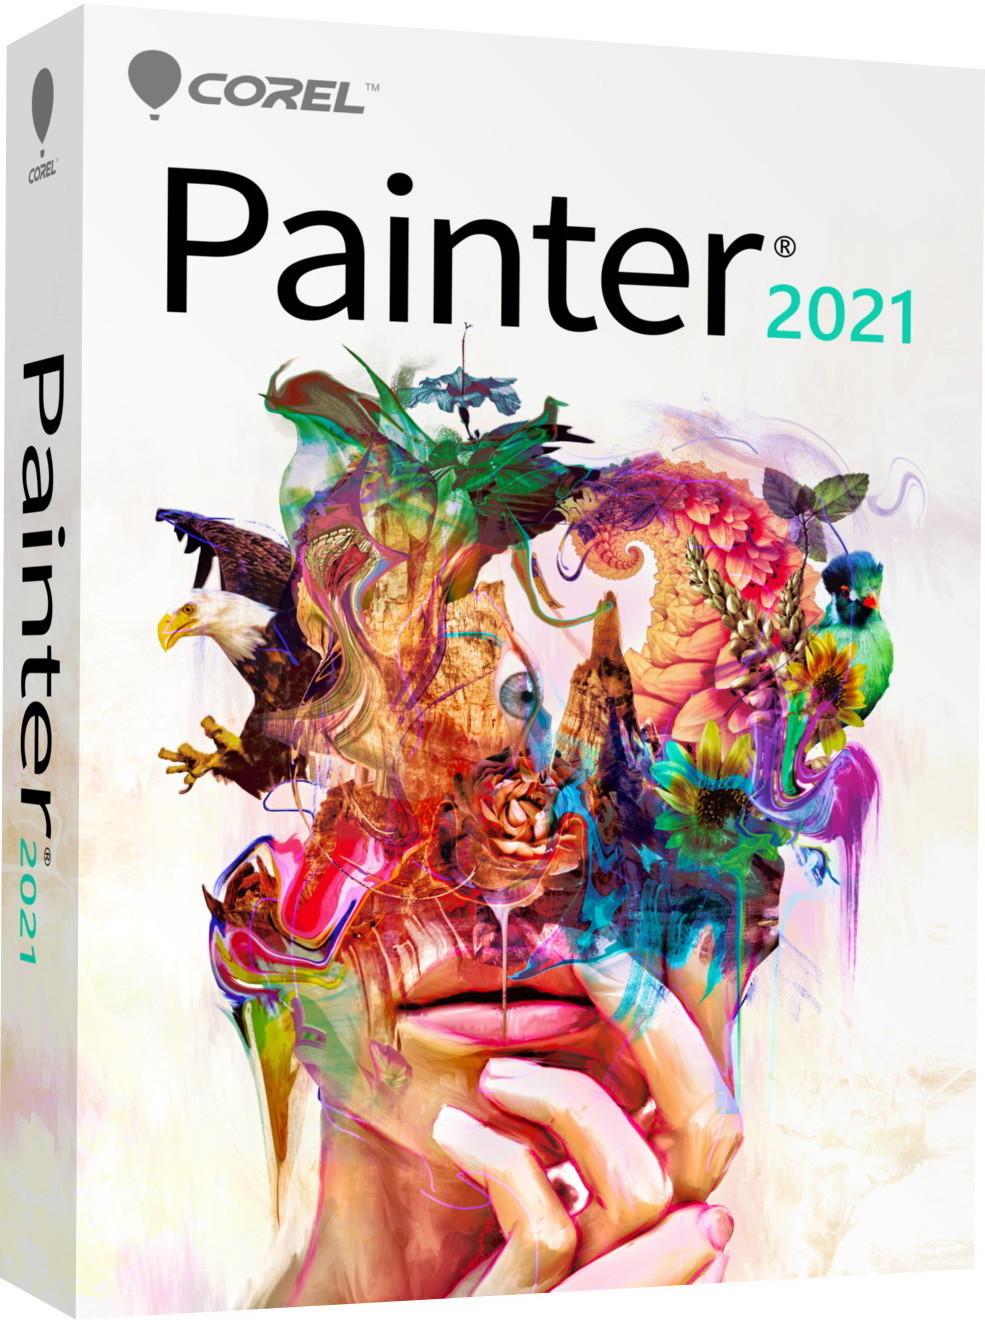 Image of Corel Painter 2021